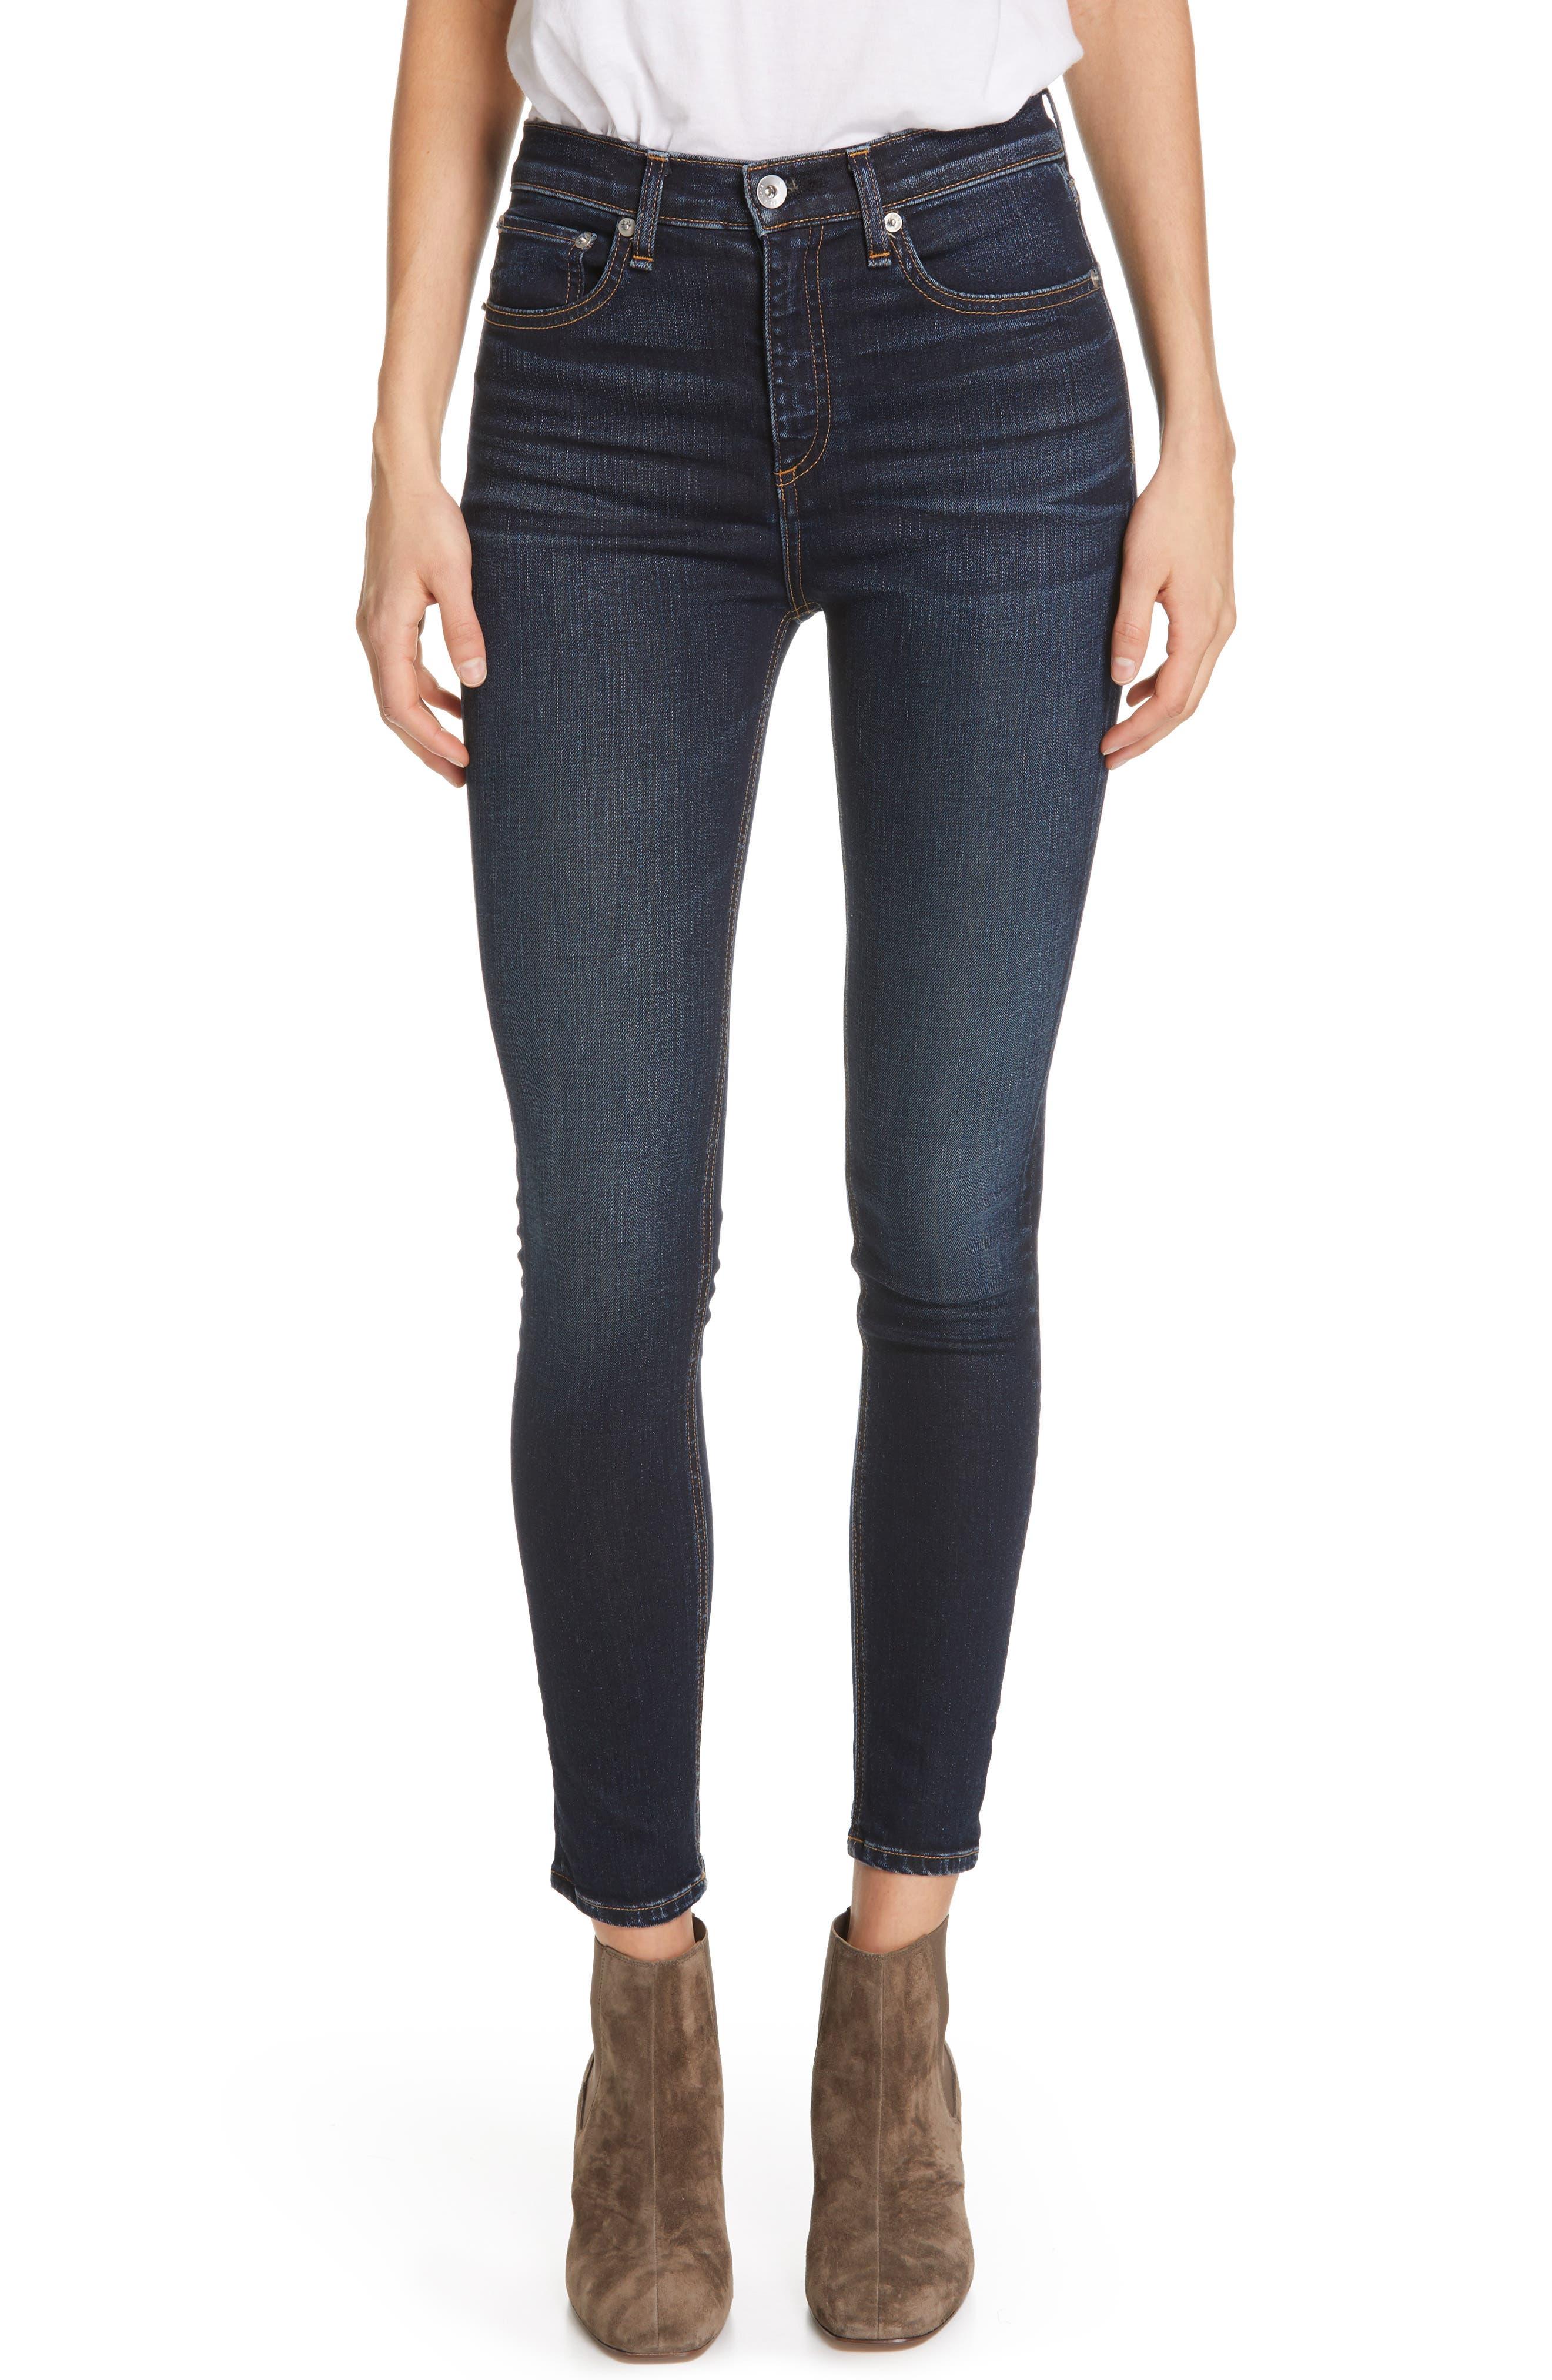 RAG & BONE, High Waist Ankle Skinny Jeans, Main thumbnail 1, color, 420